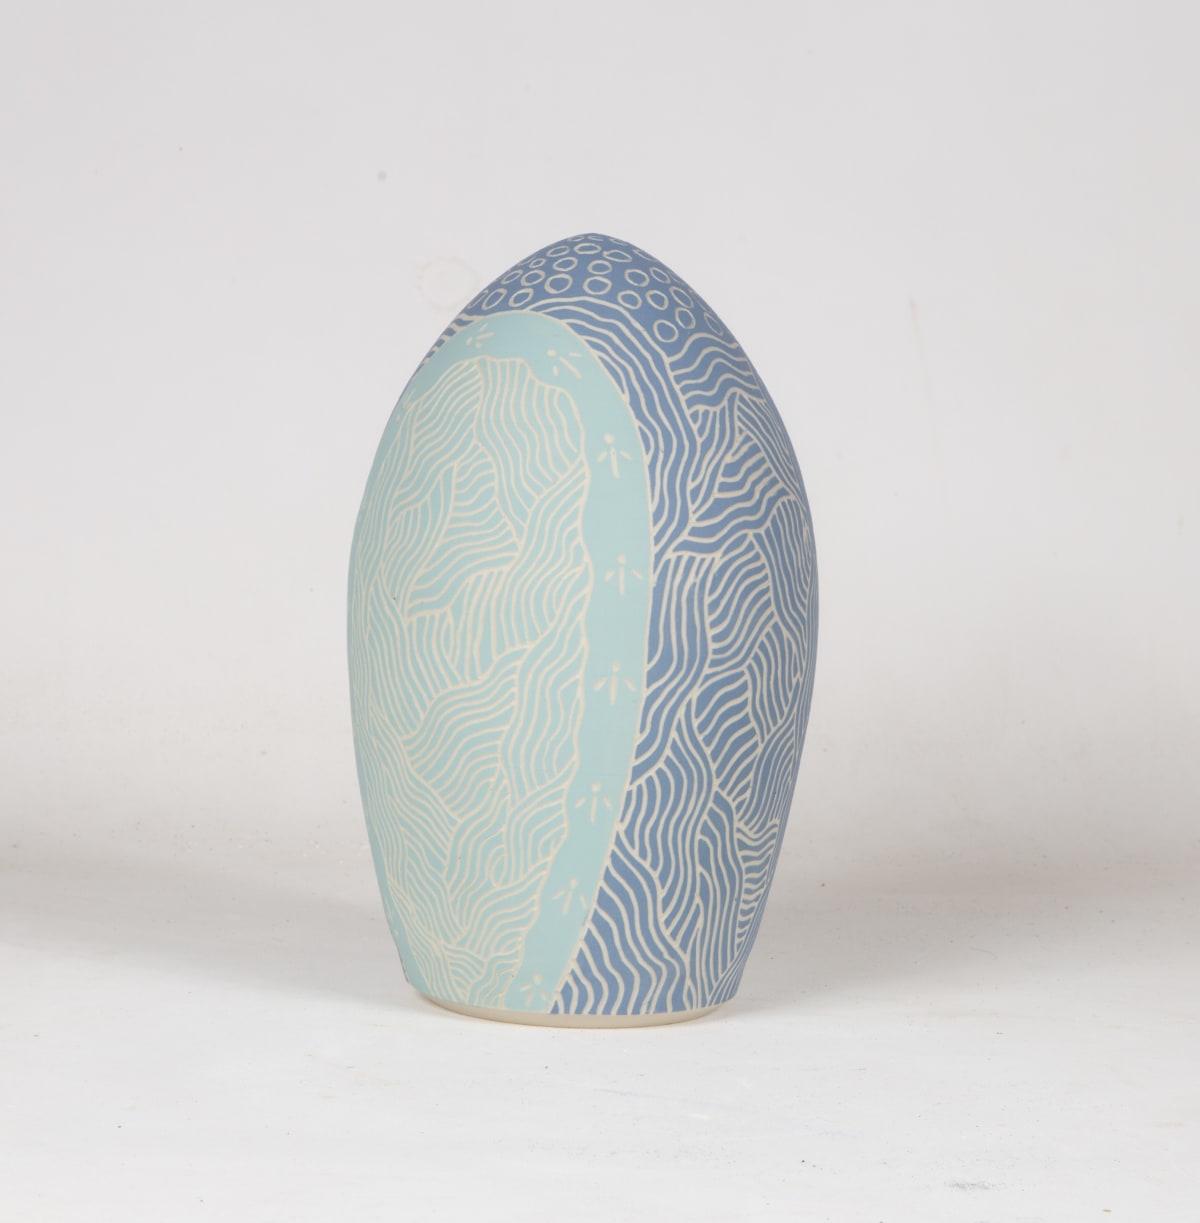 Tjutjuna Andy Tjutjuna's kalaya tjukualaya tjukurpa (emu dreaming), 2018 Stoneware 27 x 15 cm